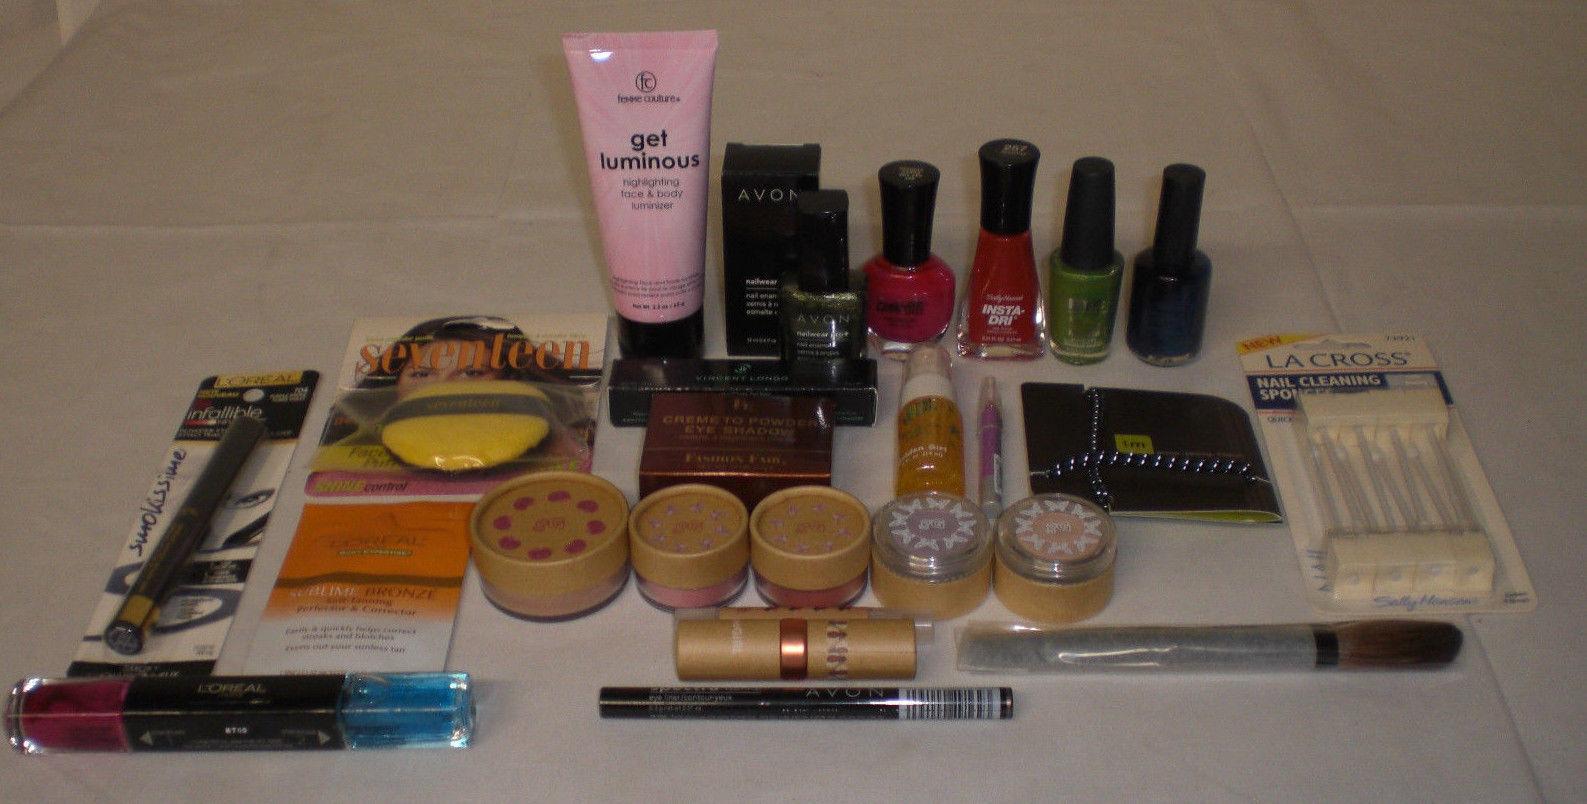 Brand name mixed makeup cosmetics HBA Sally Hansen Avon NYC GeoGirl Lot of 150 - $65.41